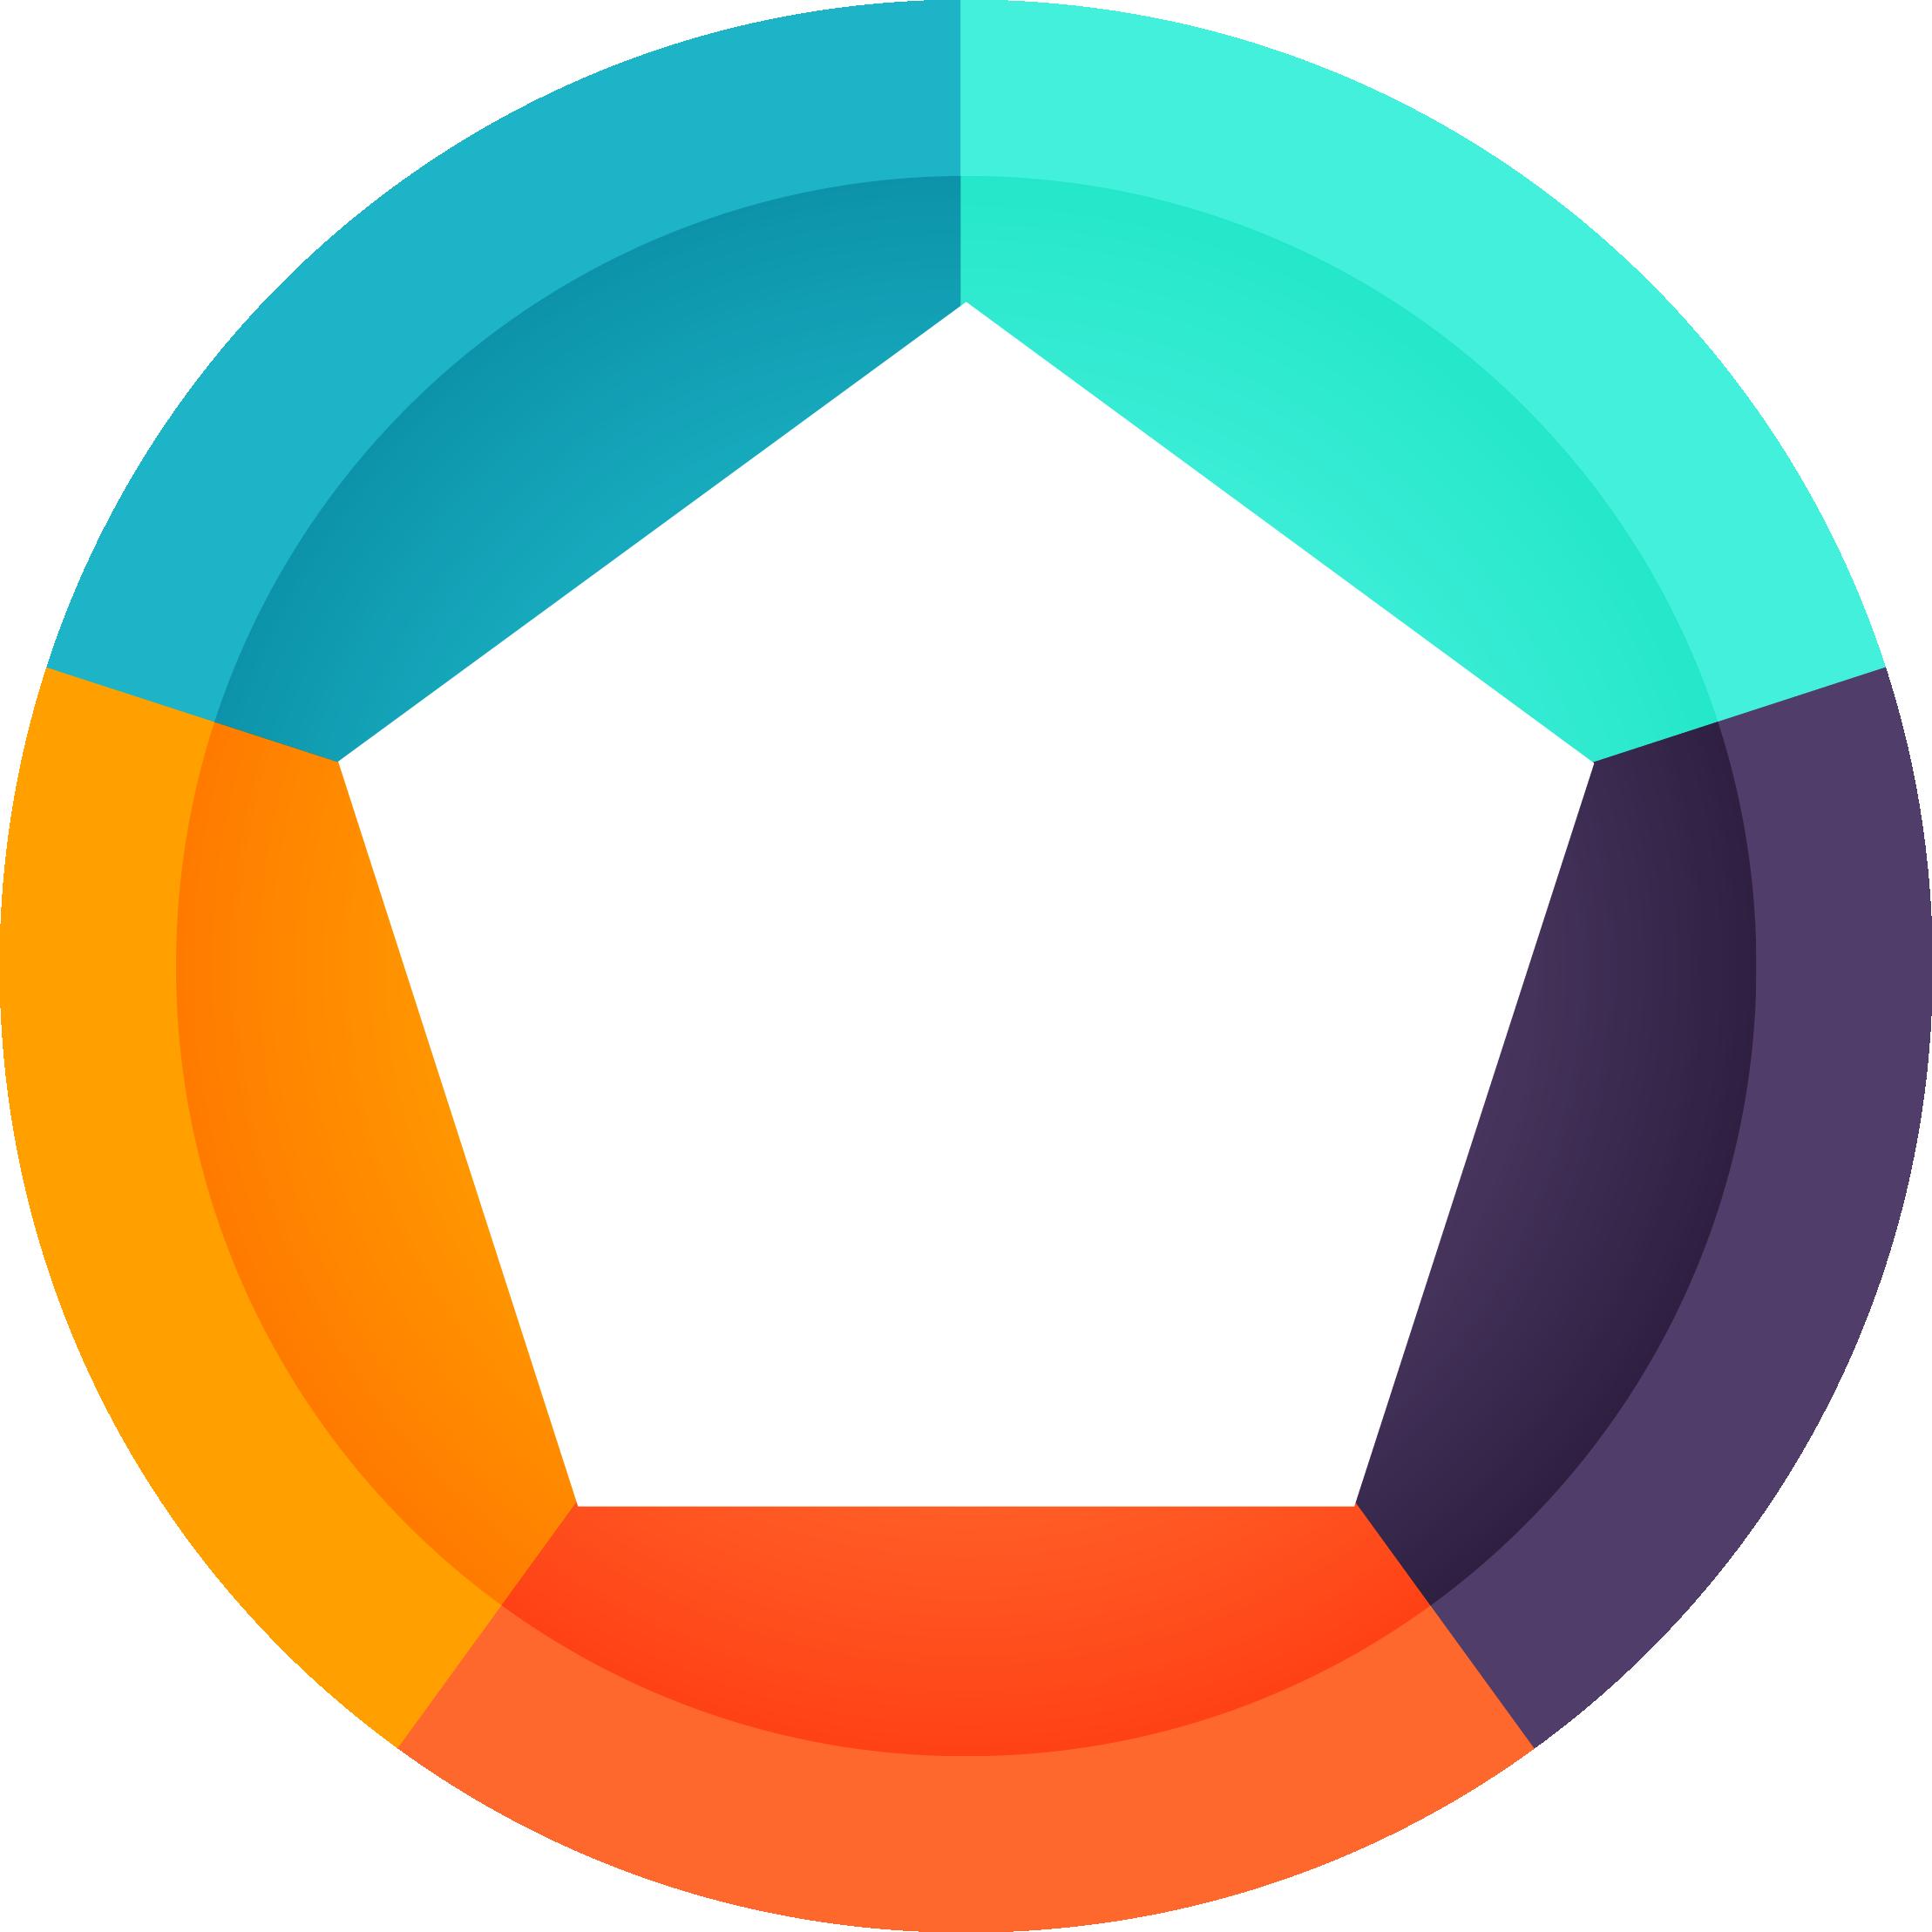 Logo clip art circular. Kiwi clipart circle